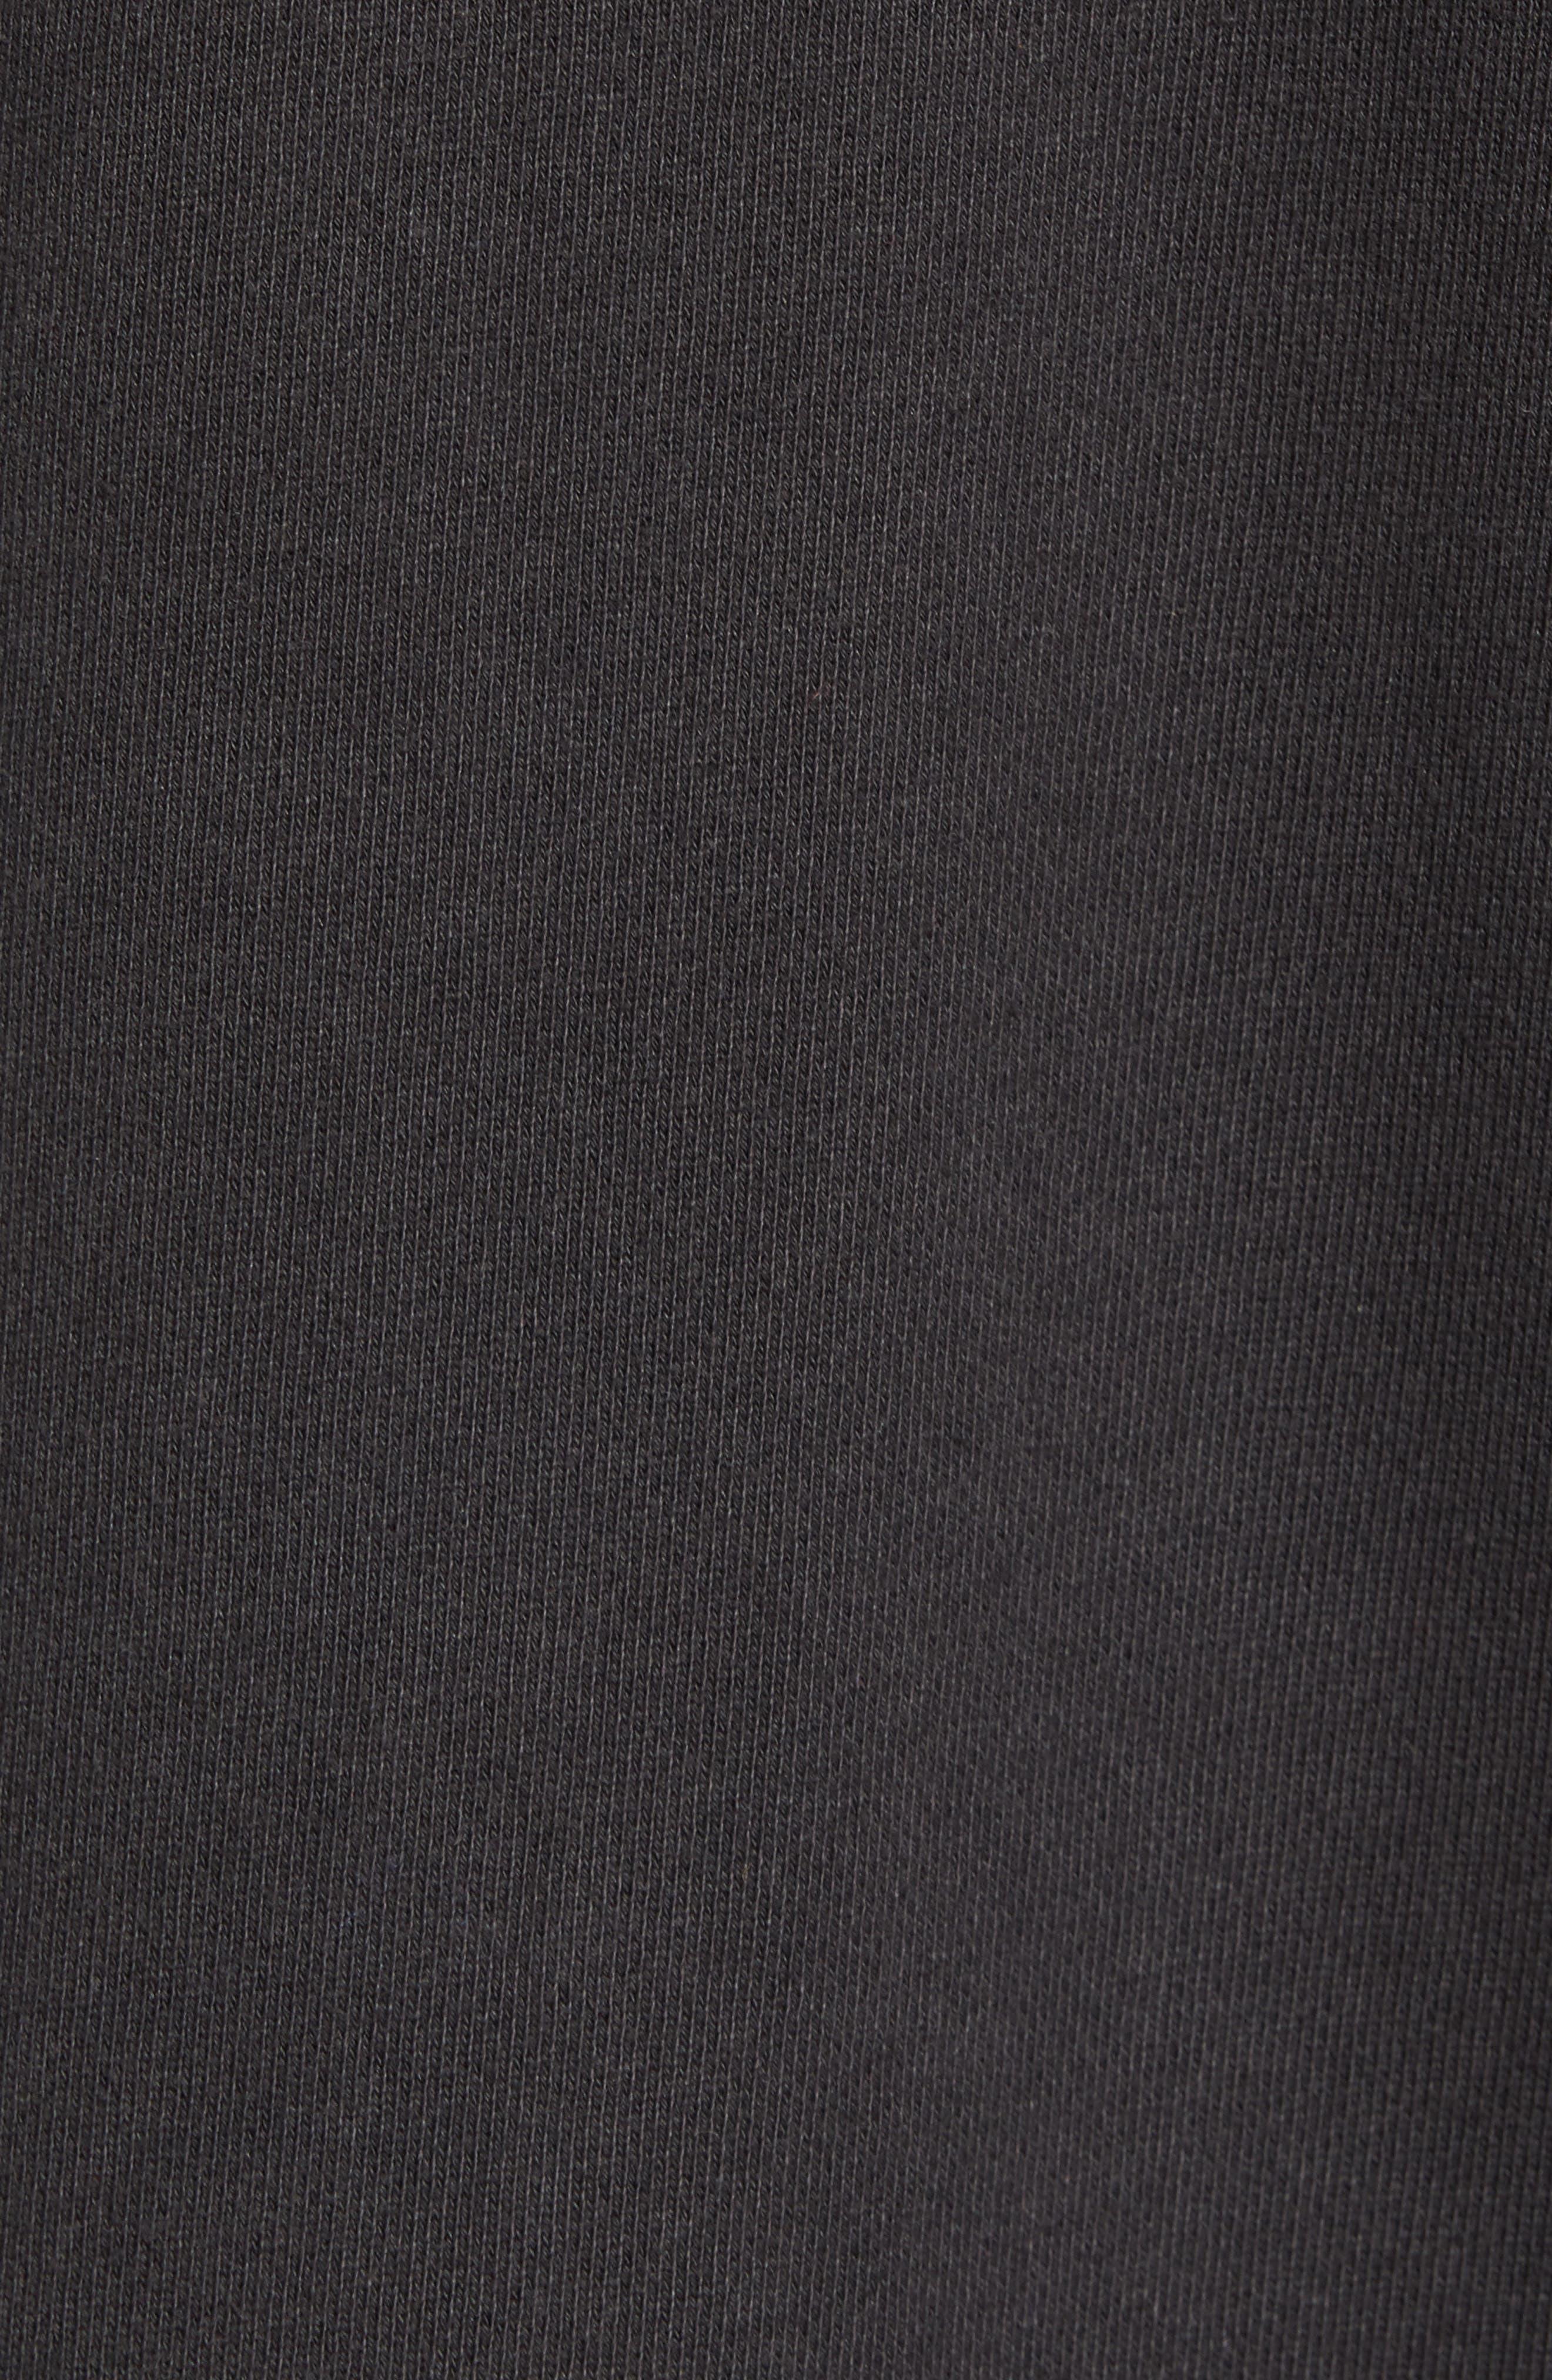 Regular Fit Hooded Zip Sweatshirt,                             Alternate thumbnail 5, color,                             001